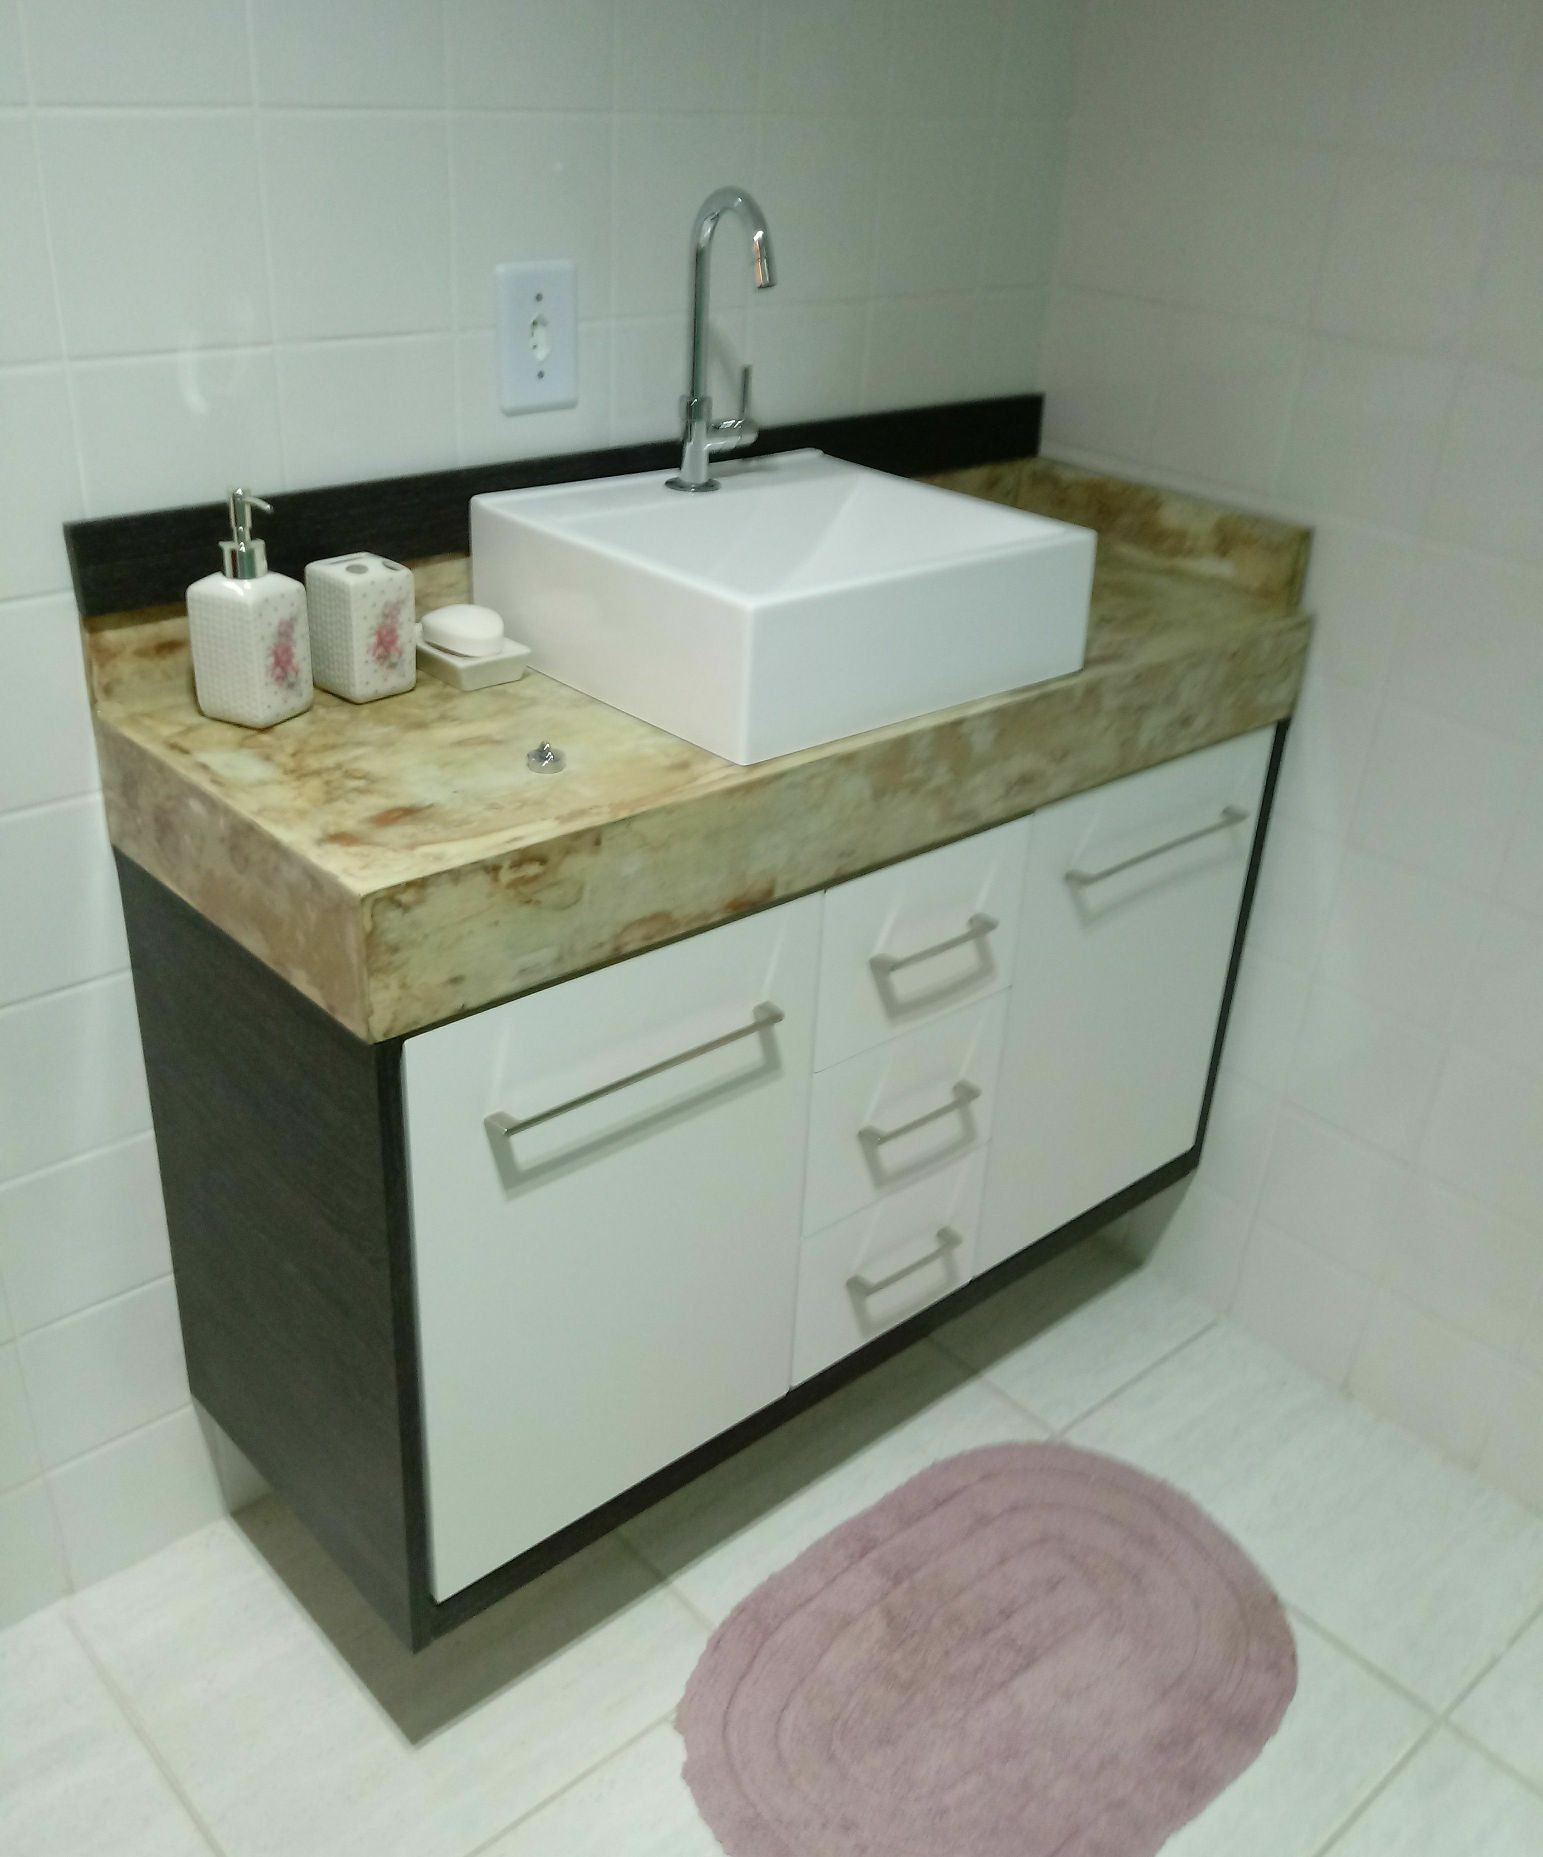 LavaboTampo resinado efeito marmore travertino